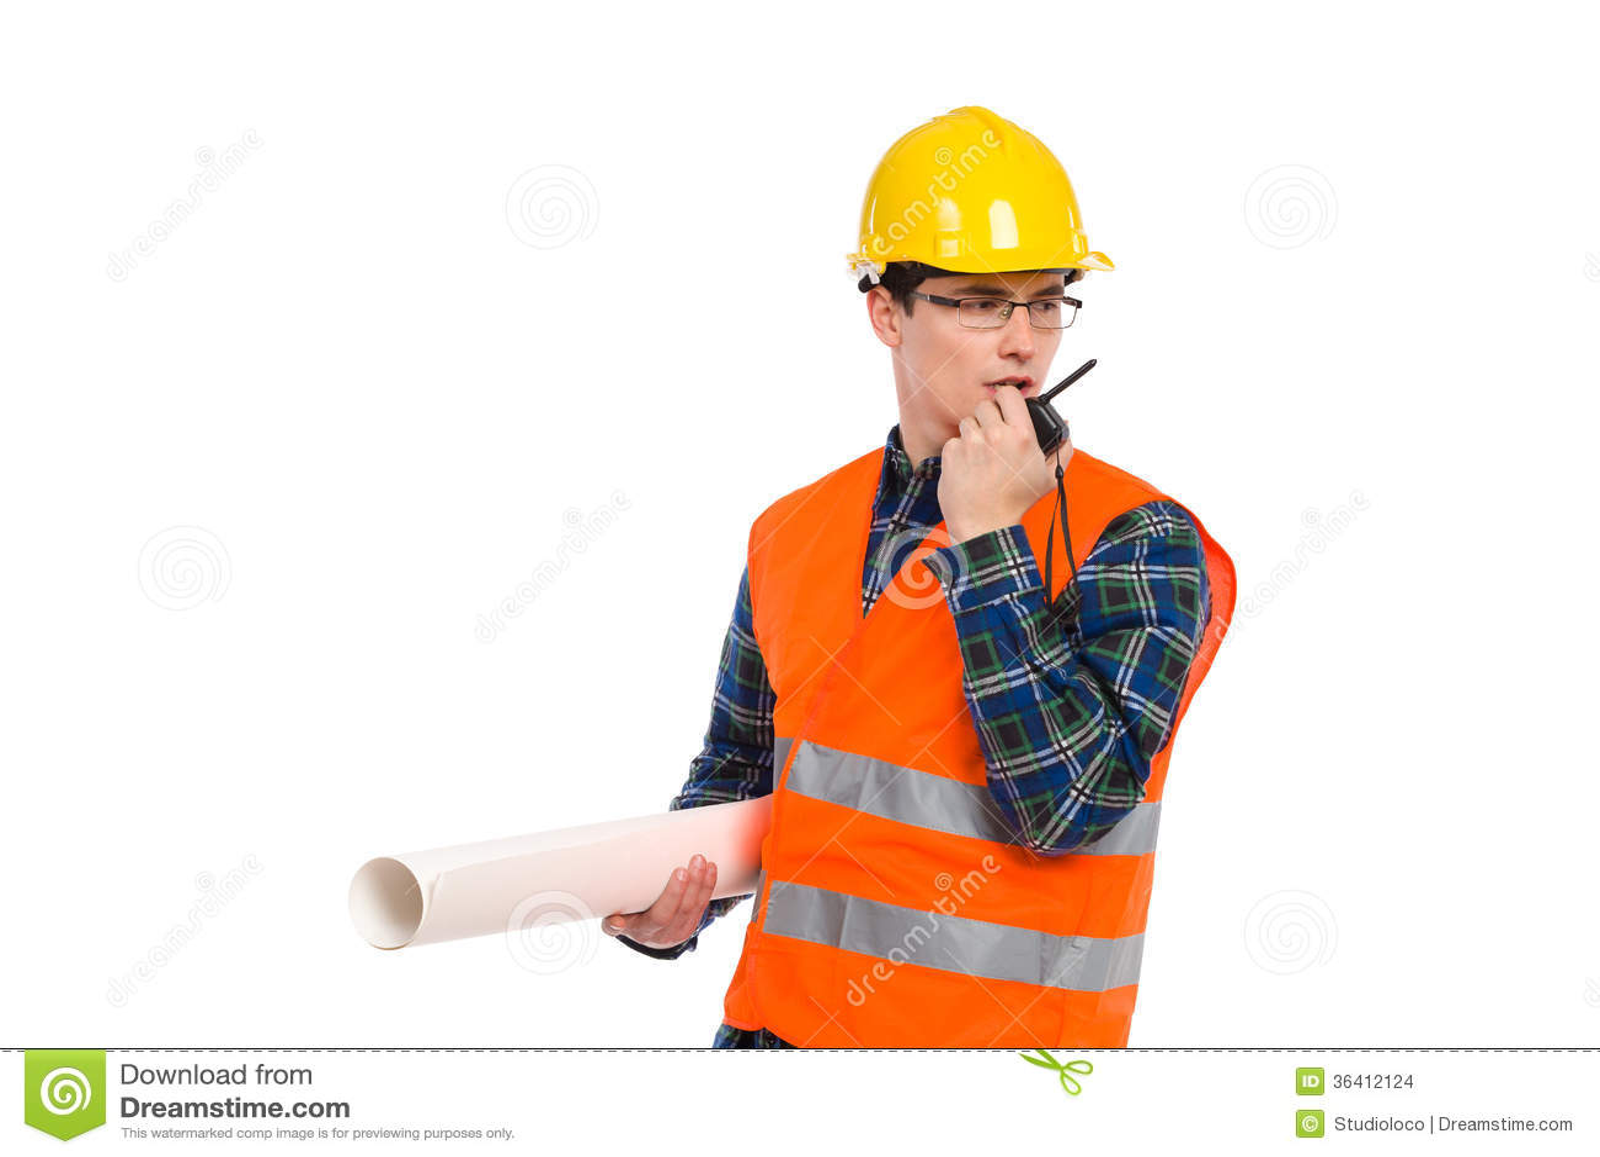 essay construction flutes